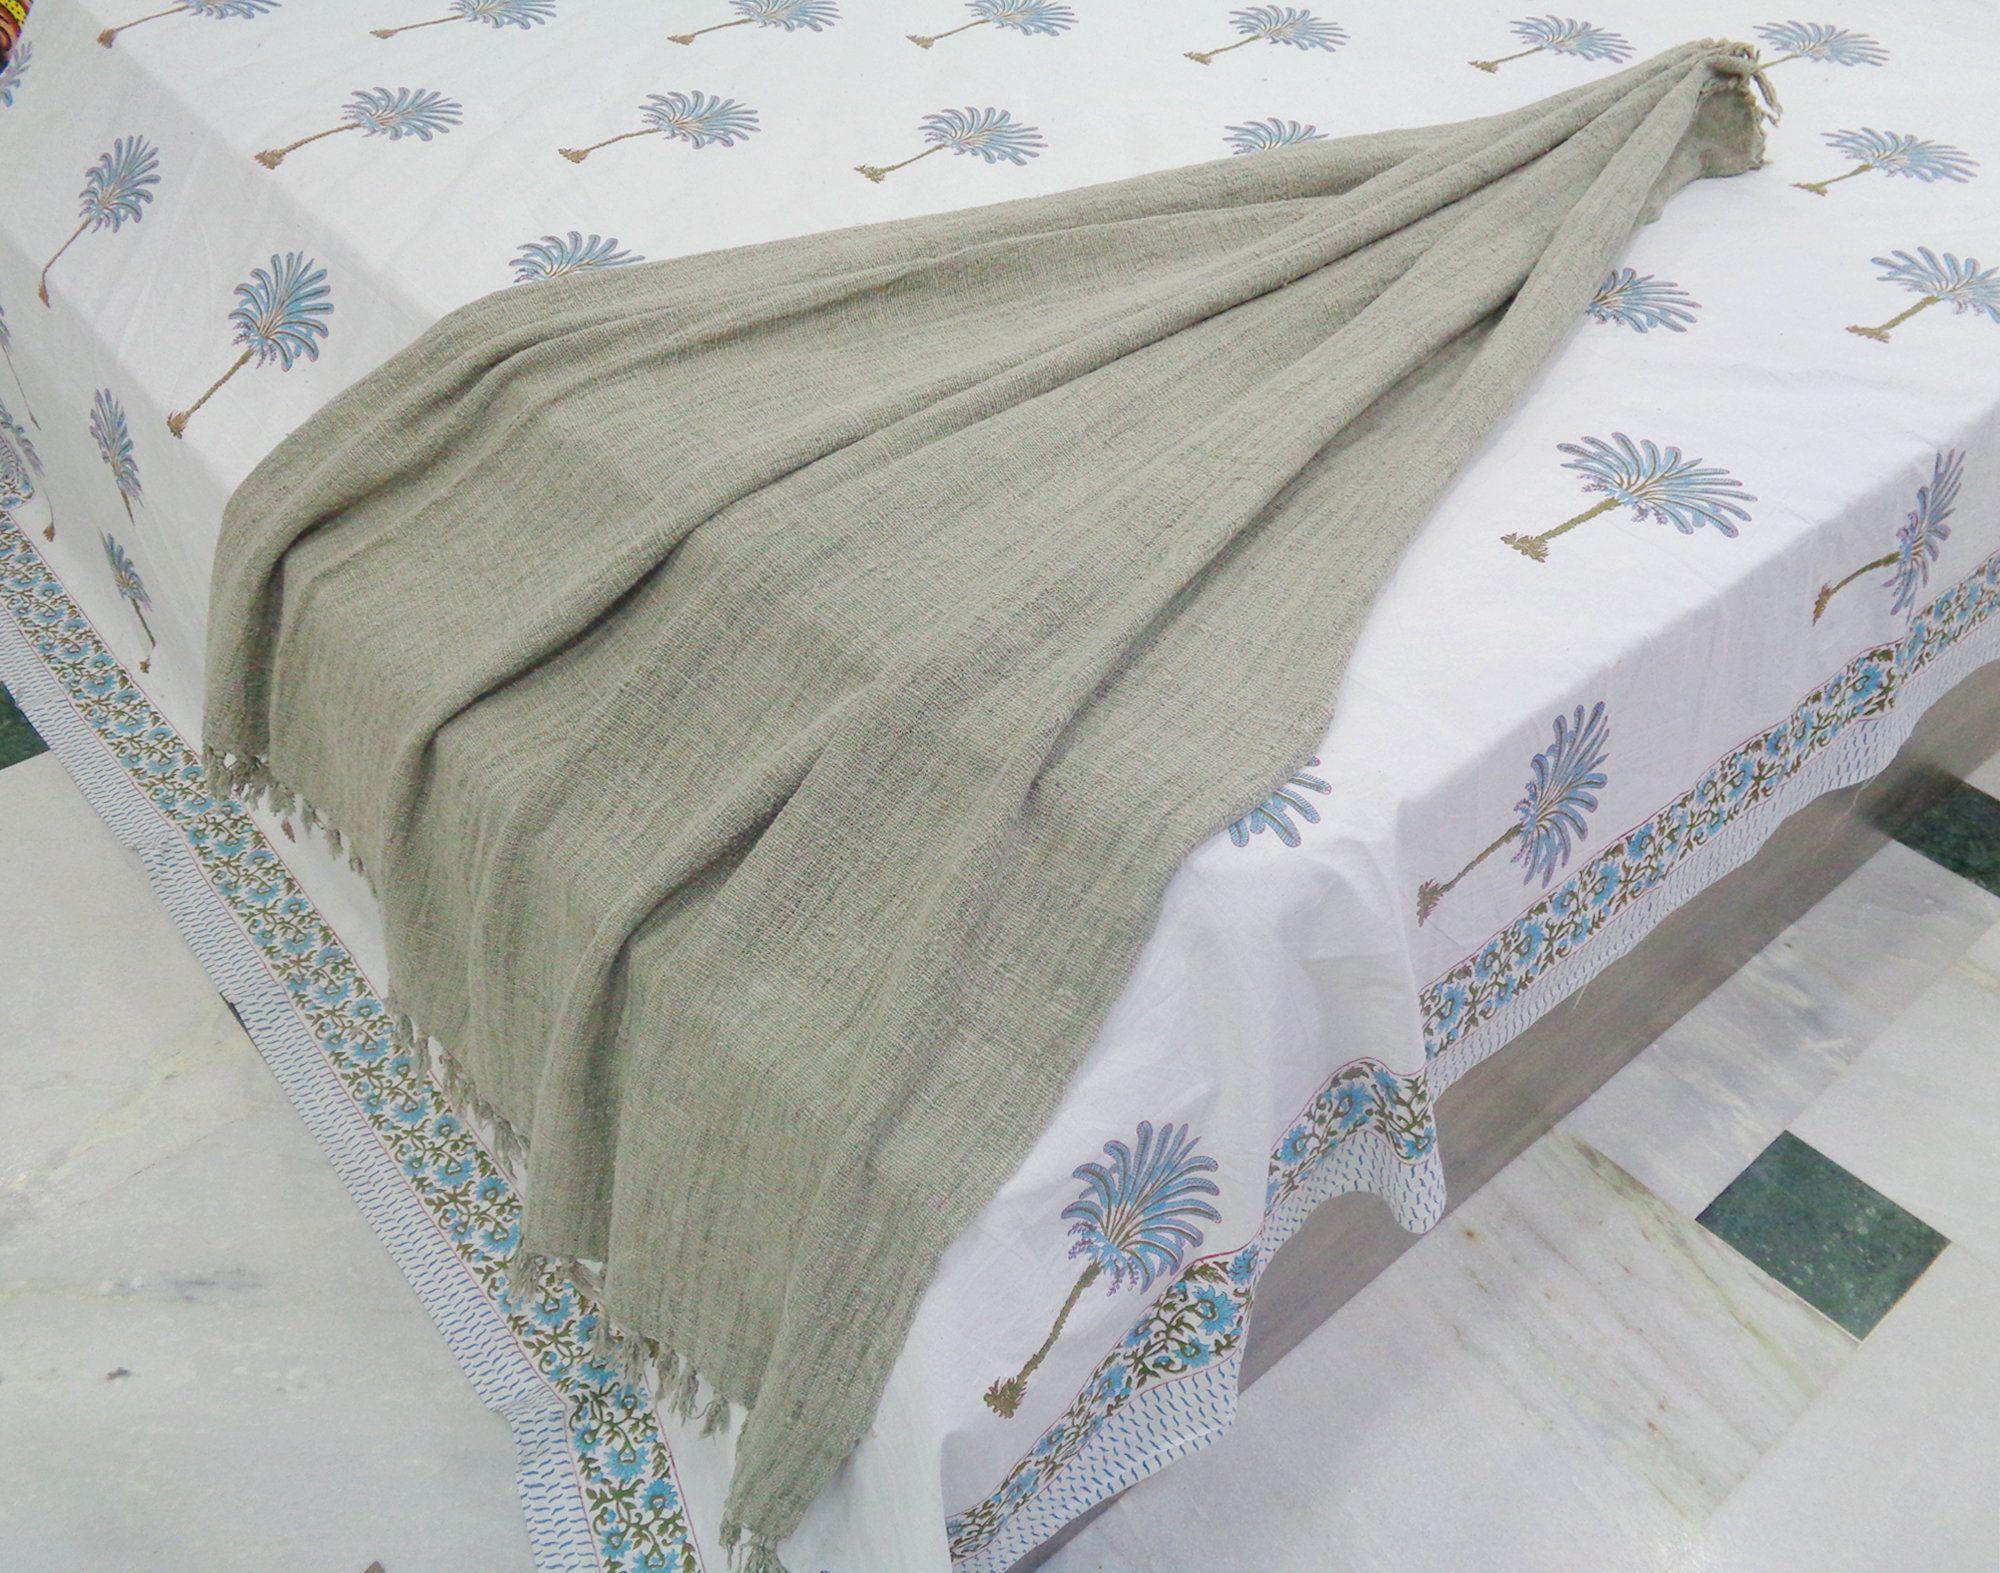 50x70 Inch Handmade Throw Cotton Gray Blanket Indian Sofa Boho Throw Bohemian Throw Handloom Cotton Bed Scarf Cotton Couch Throw In 2020 Handmade Throws Cotton Bedding Cotton Throws